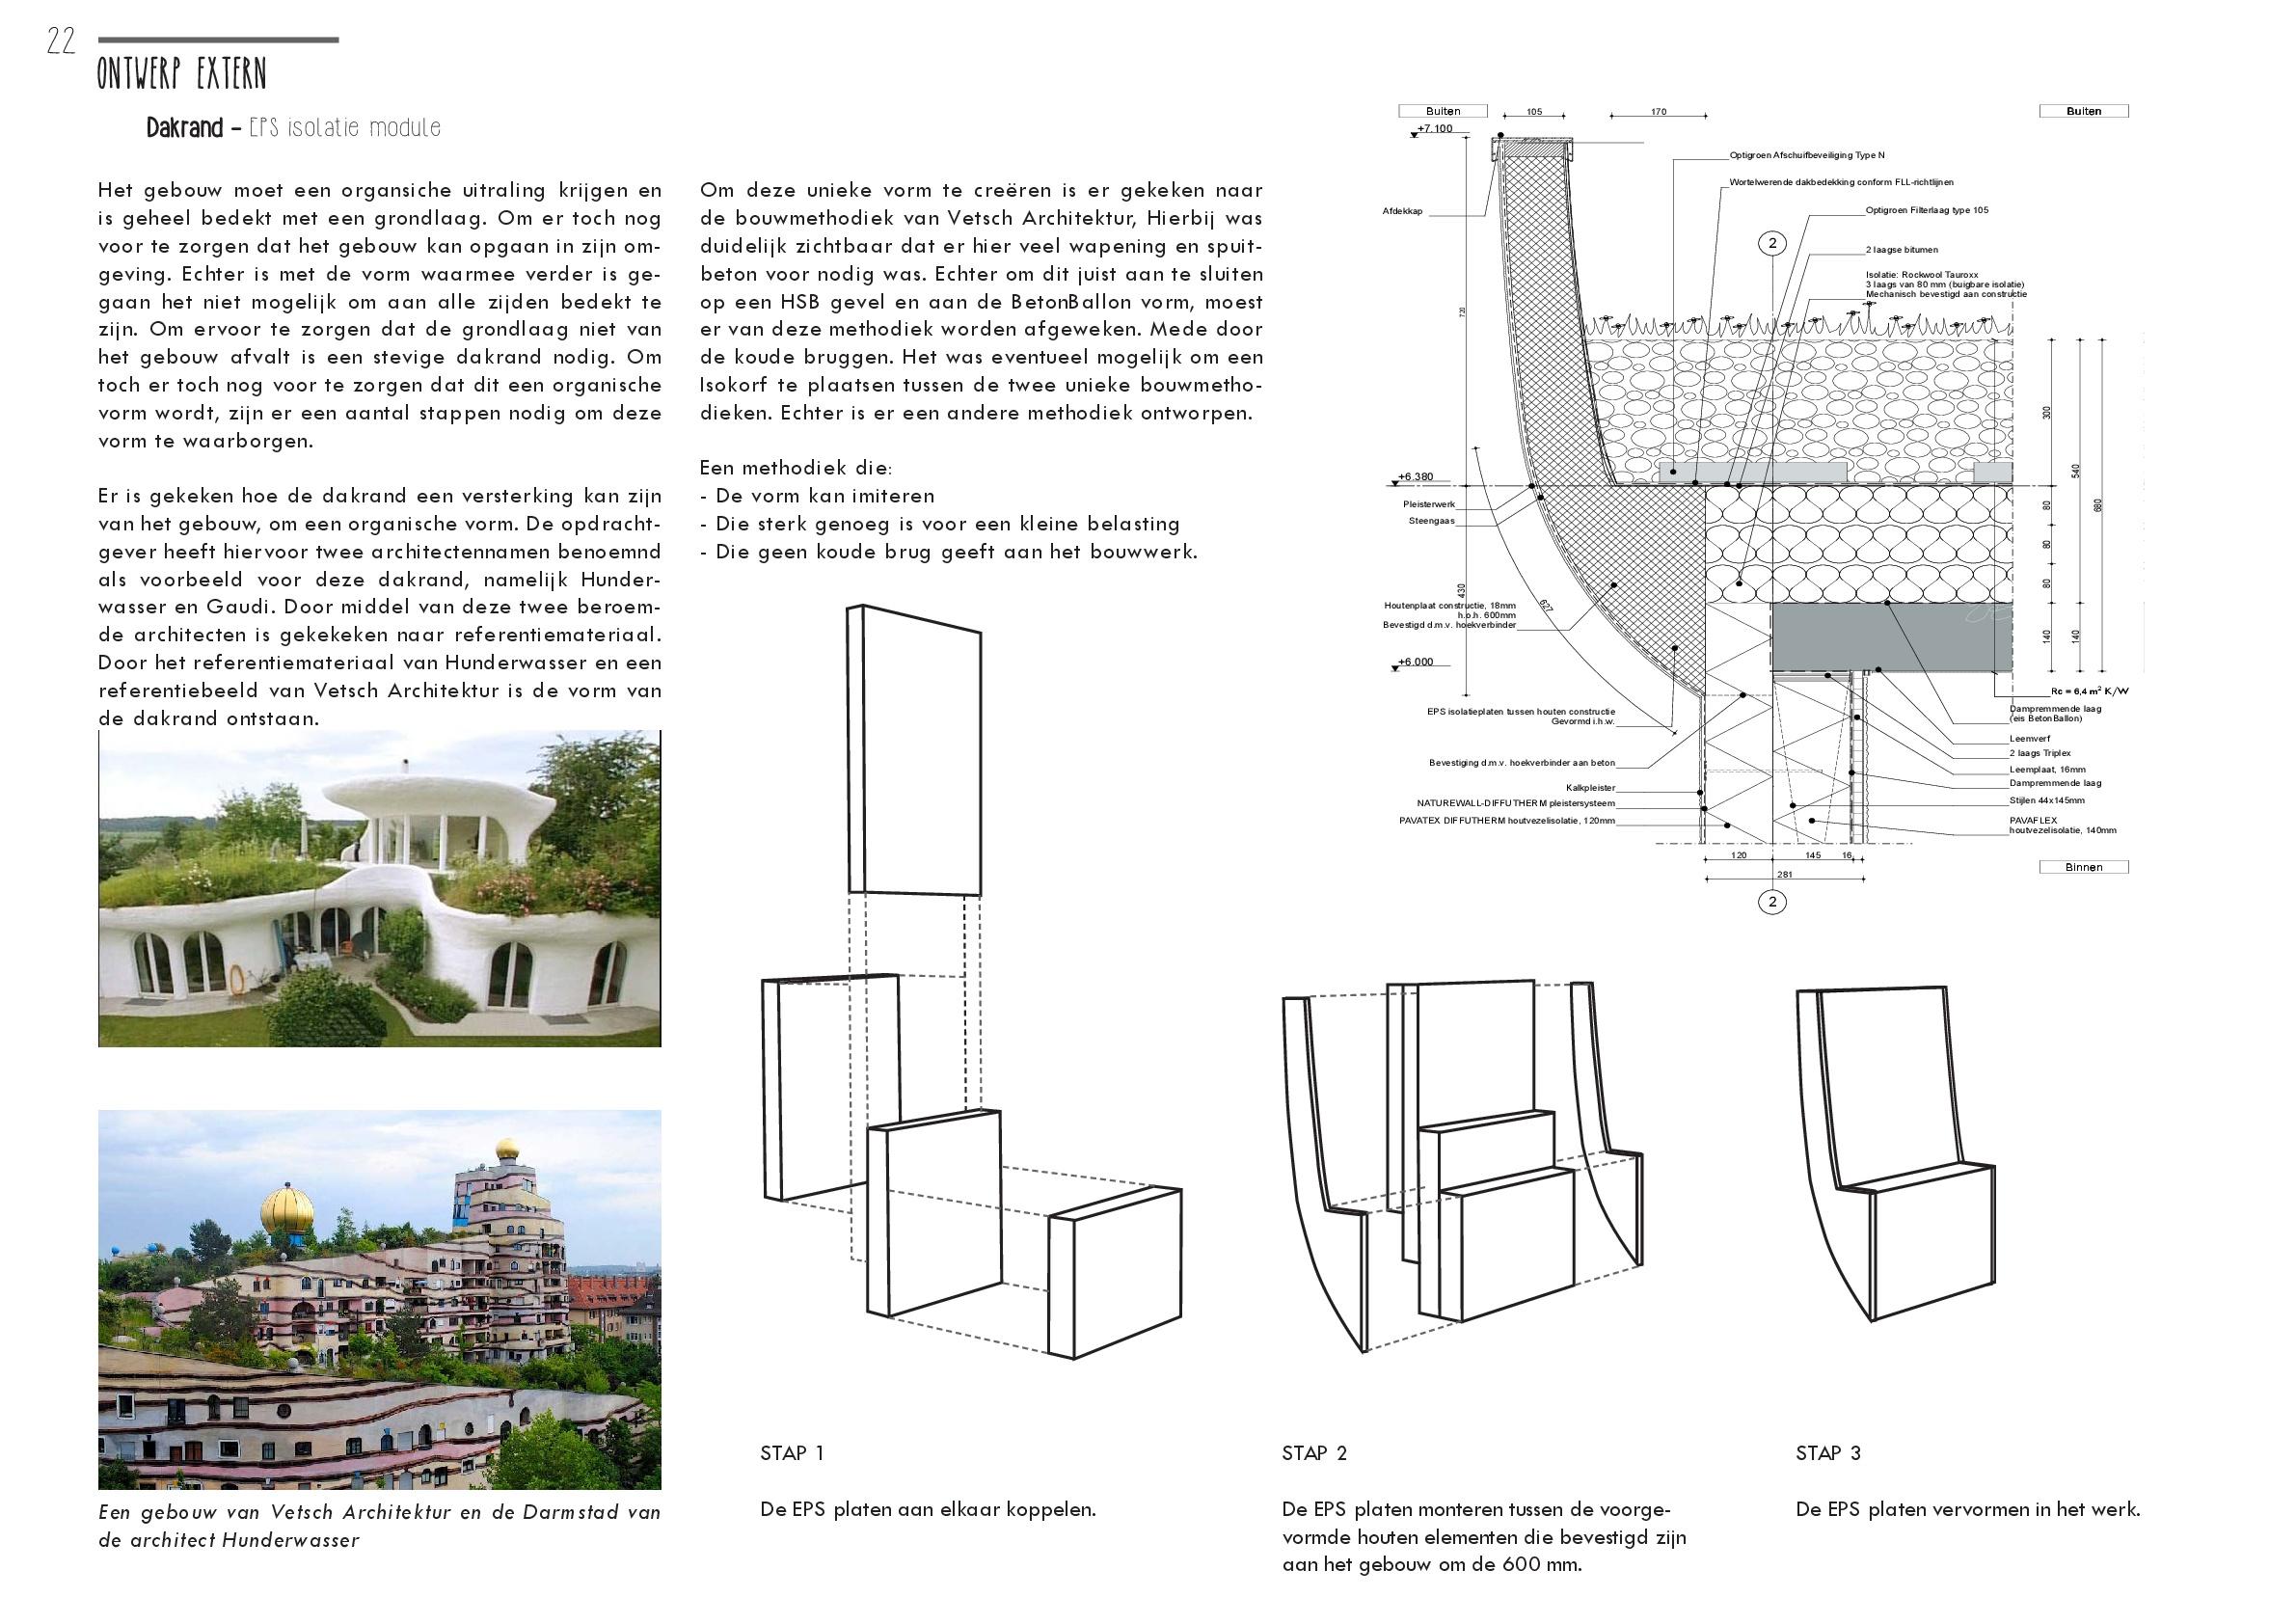 projectverslag-v2.8-inlever-022